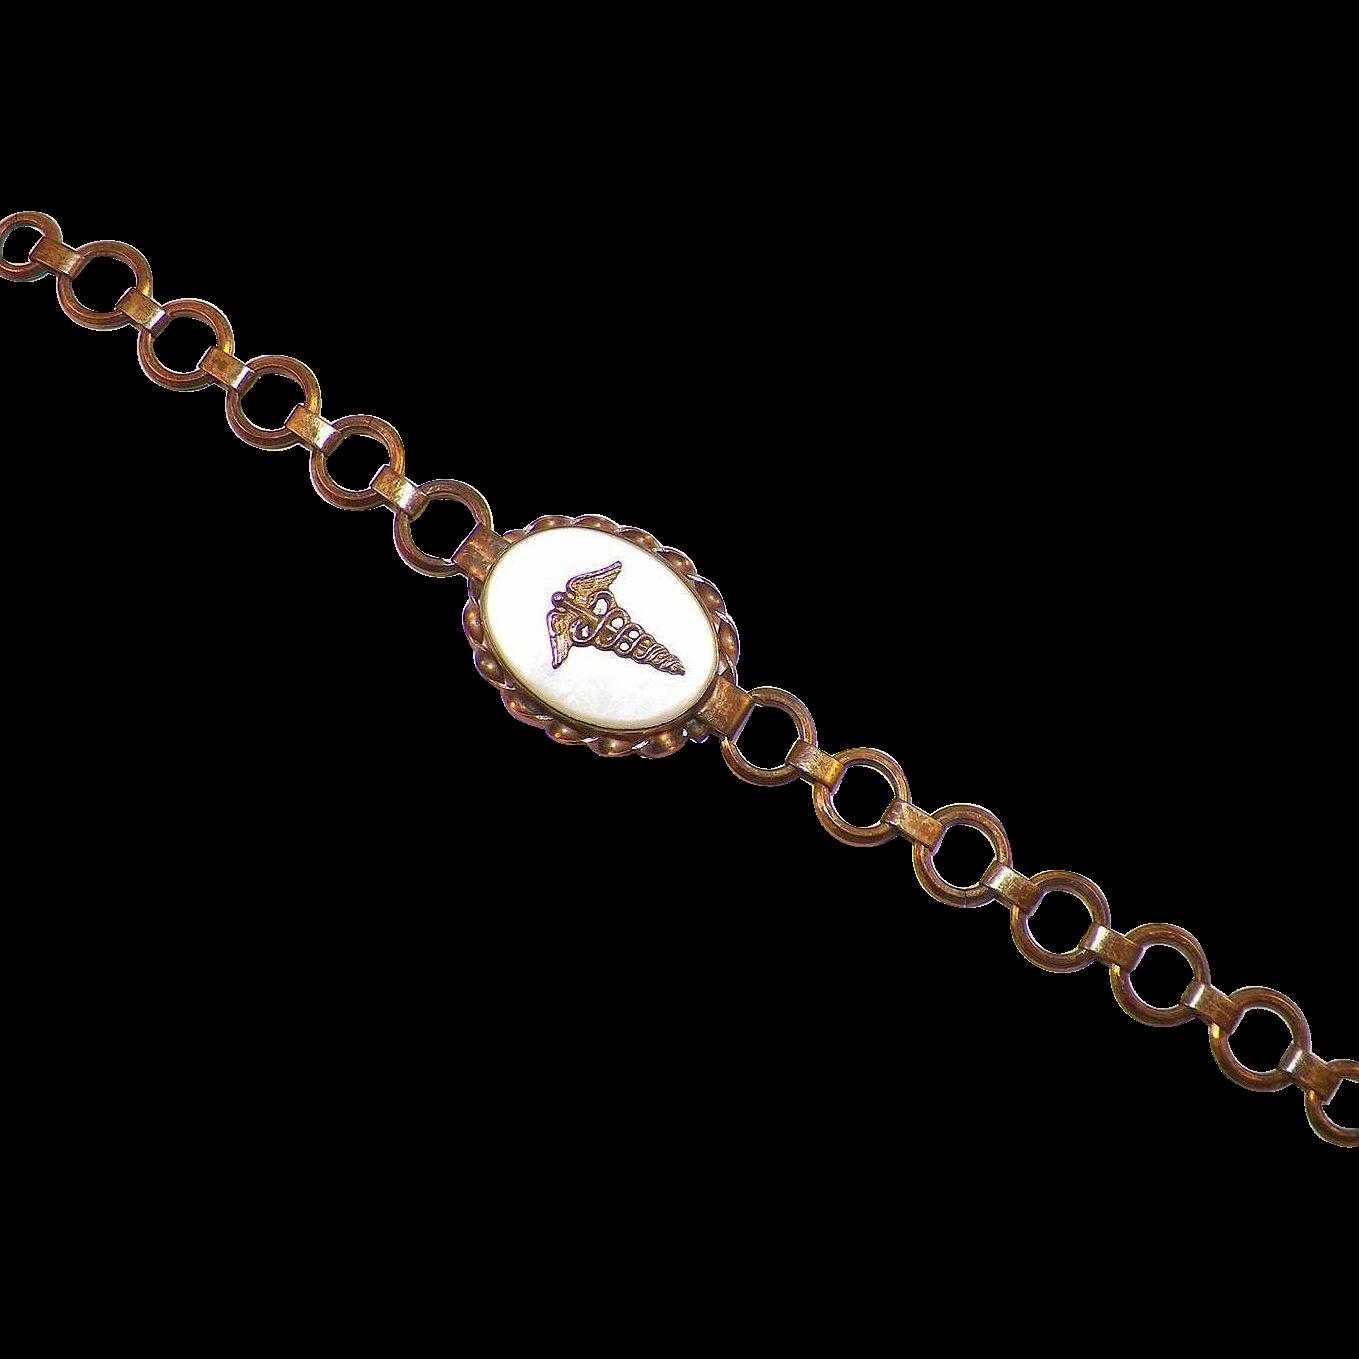 Vintage US Army Sterling Sweetheart Locket Bracelet Medical Corp